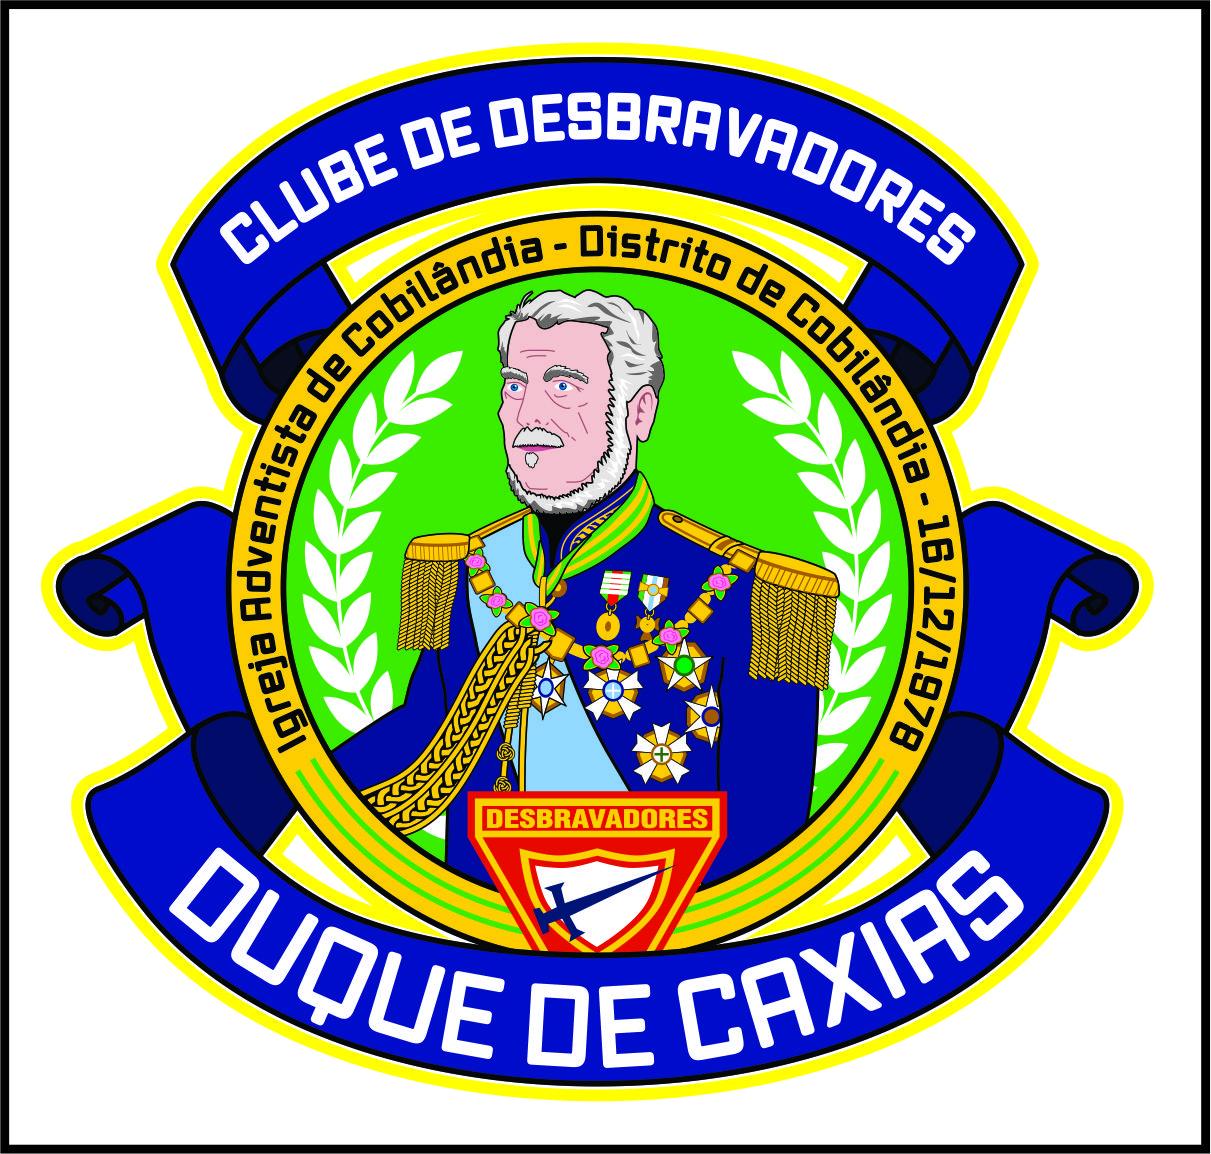 DUQUE DE CAXIAS DB